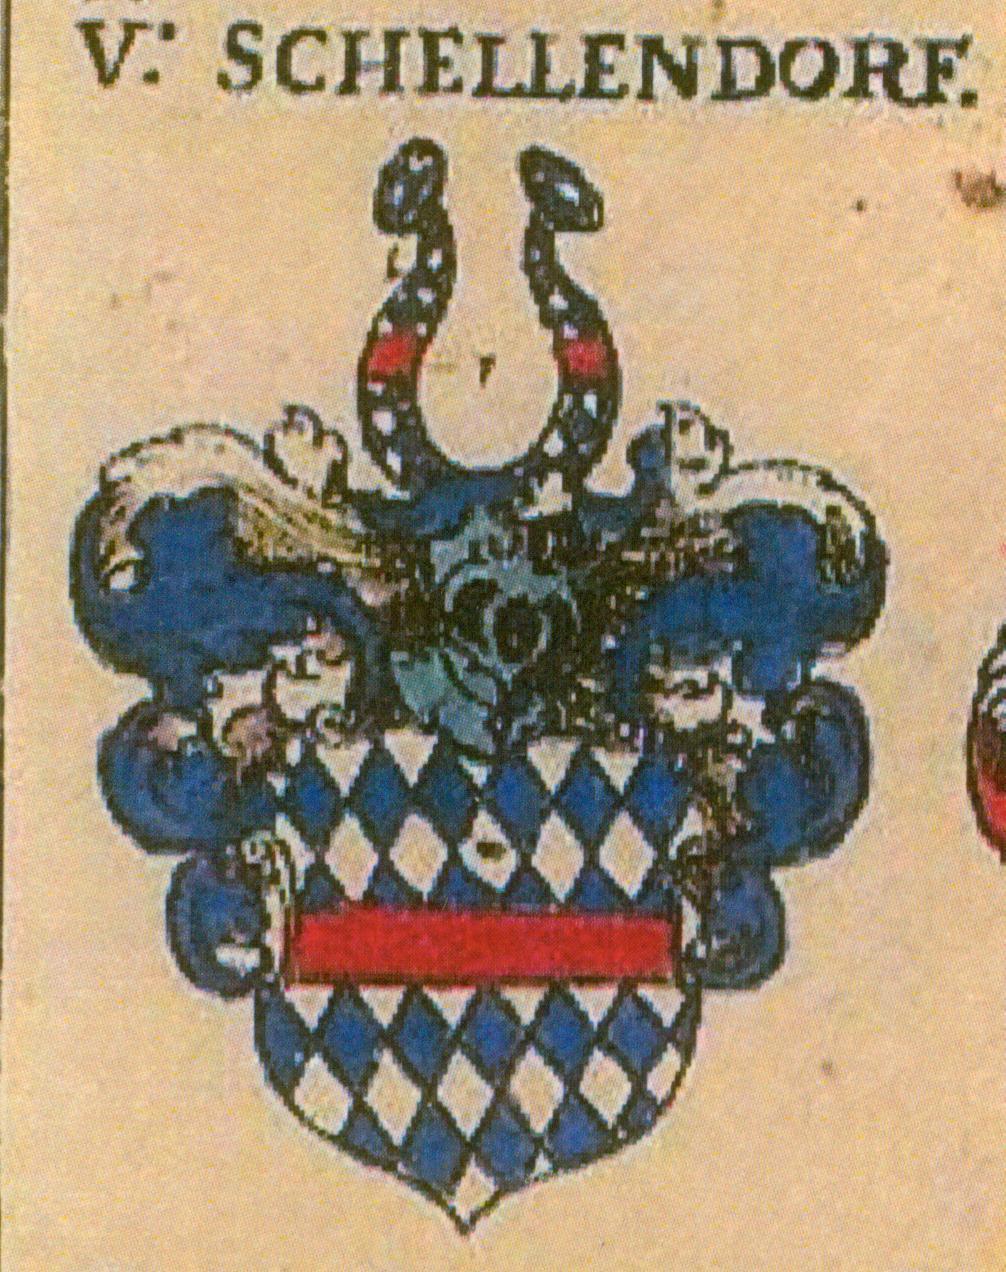 Schellendorf